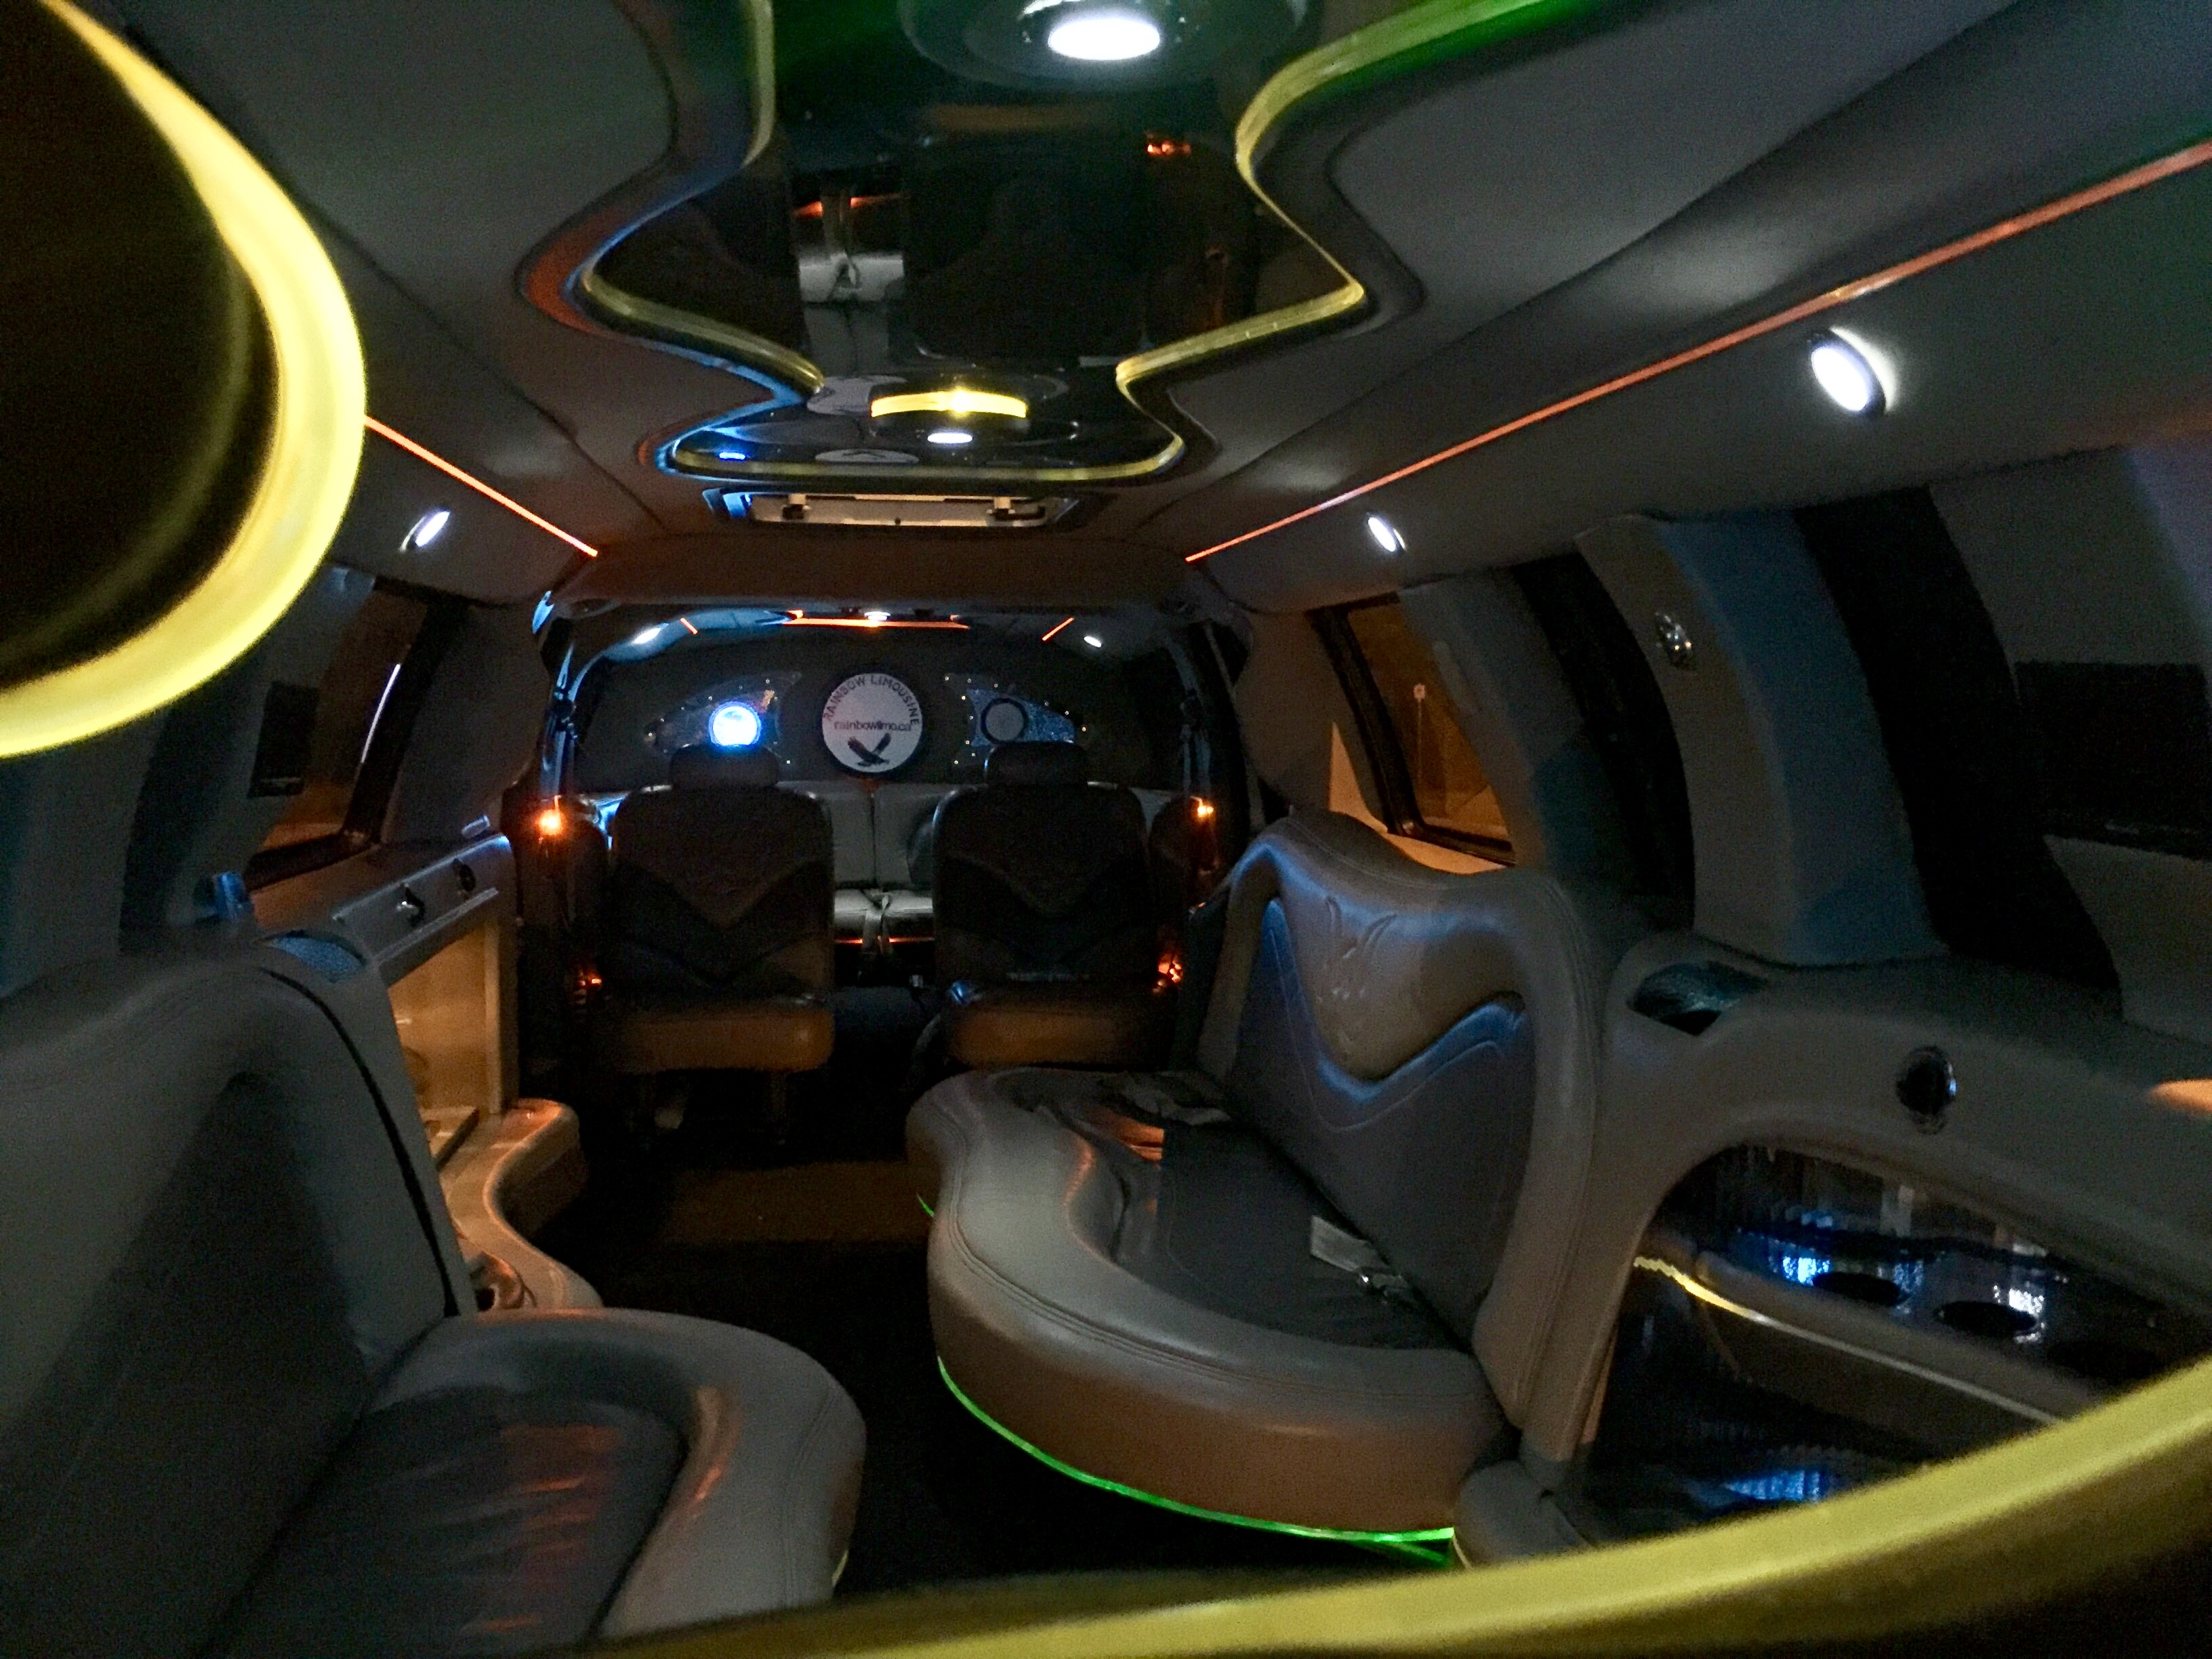 SUV limo inside